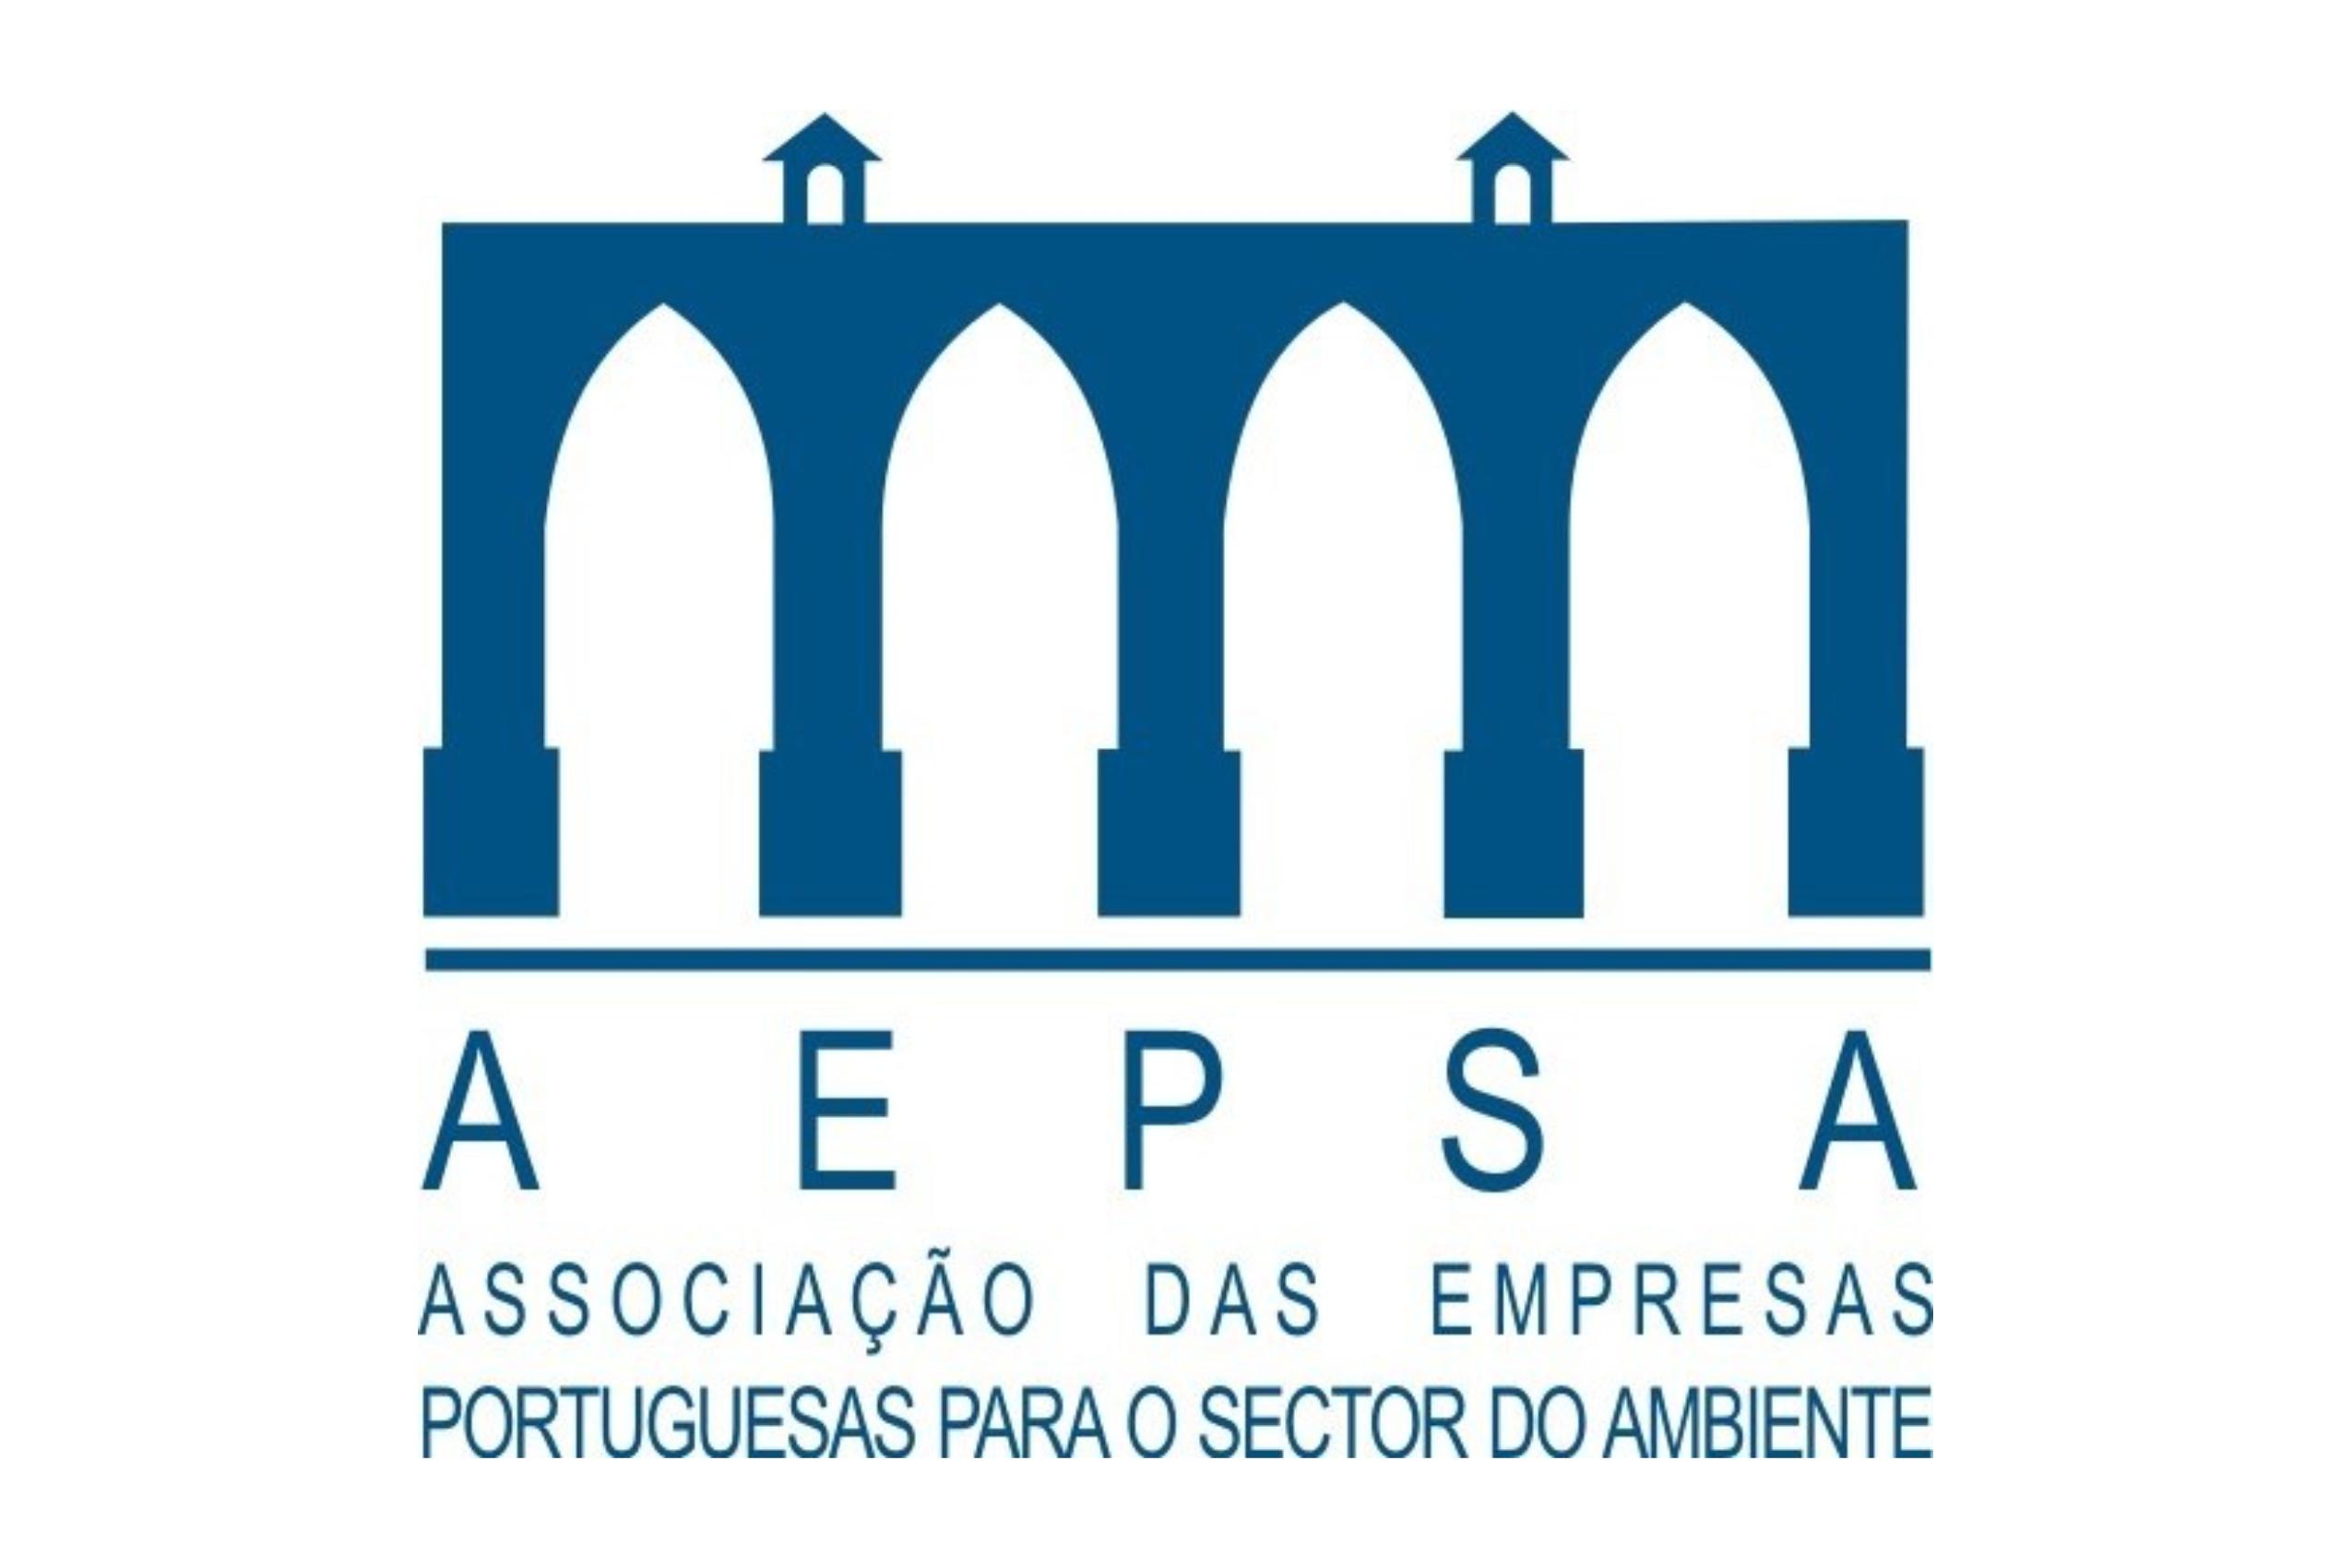 https://europeanplasticspact.org/wp-content/uploads/2021/05/aepsa-2.png